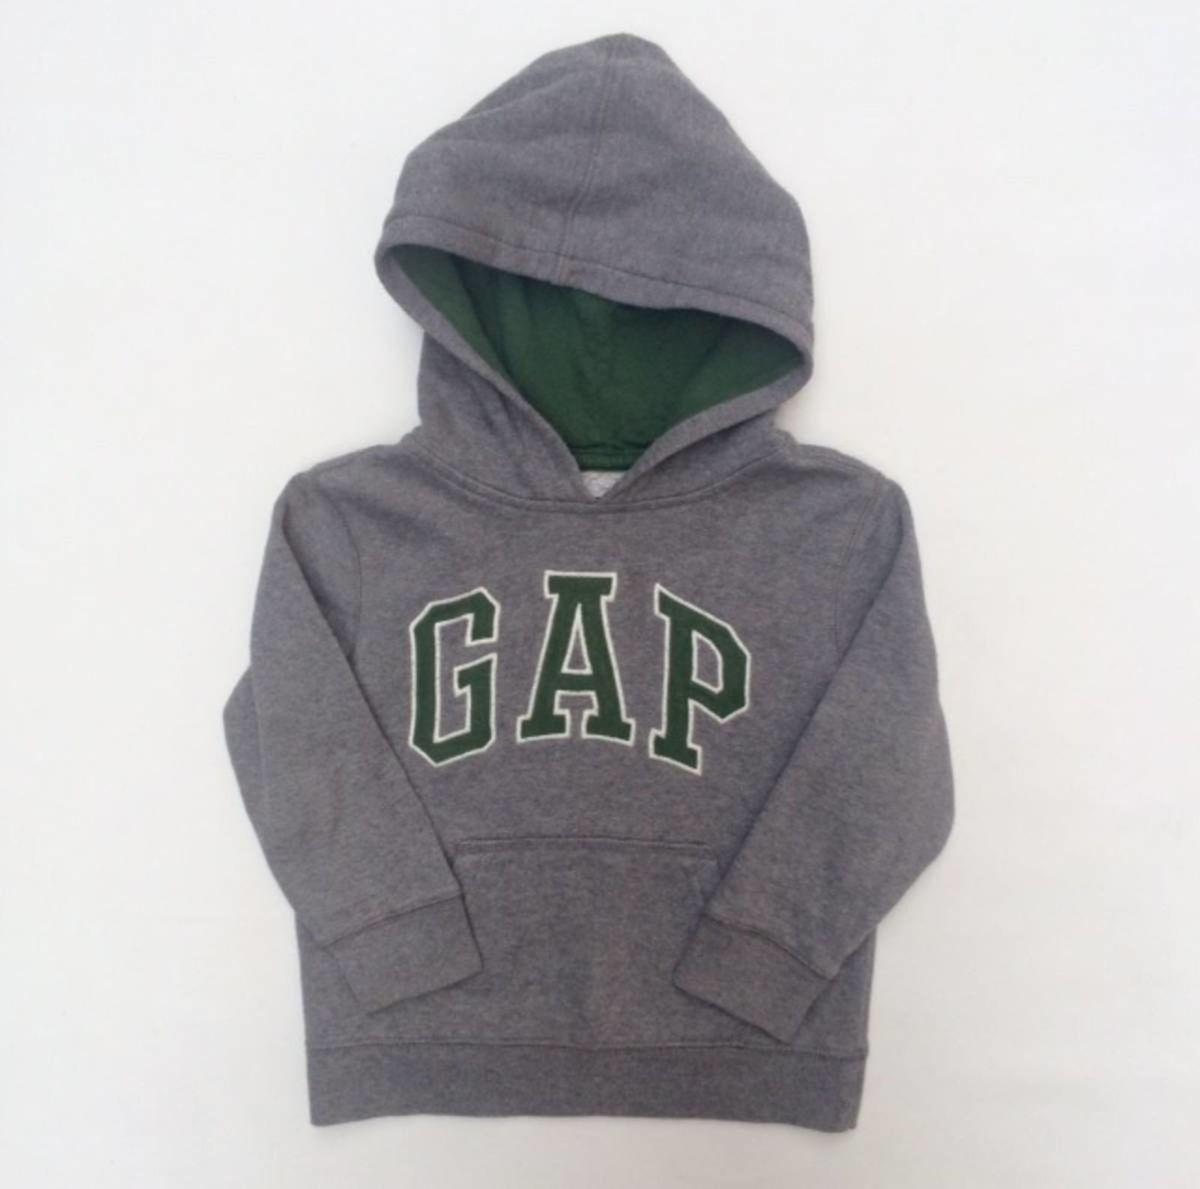 moletom cinza gap - tamanho 4 anos - menino gap.  Czm6ly9wag90b3muzw5qb2vplmnvbs5ici9wcm9kdwn0cy8yntm2mzcvyje5ogywmtg4yjnjnjjjm2iyndq1n2u0ogm1mwqznweuanbn 9cf6d05210f